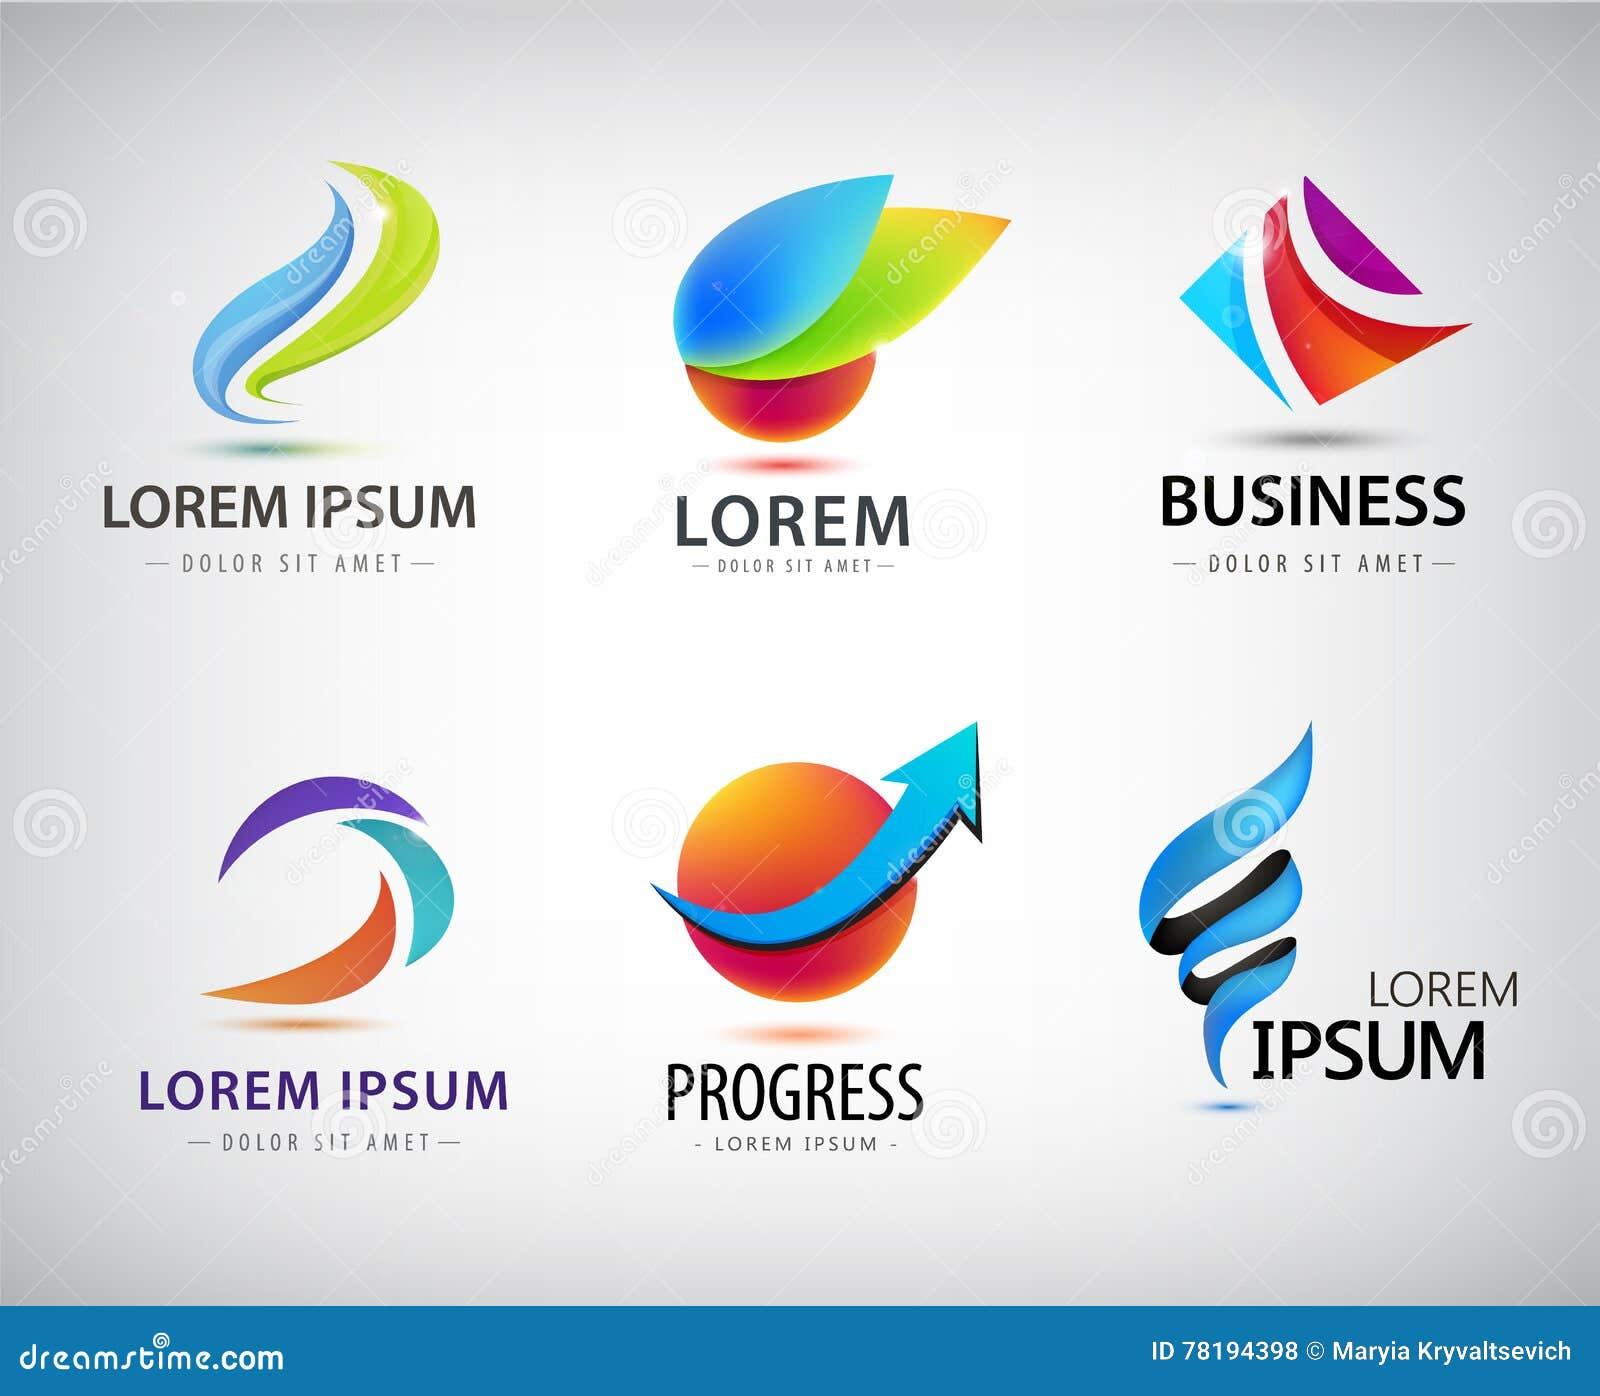 vector set of abstract logo design web icons 3d templates